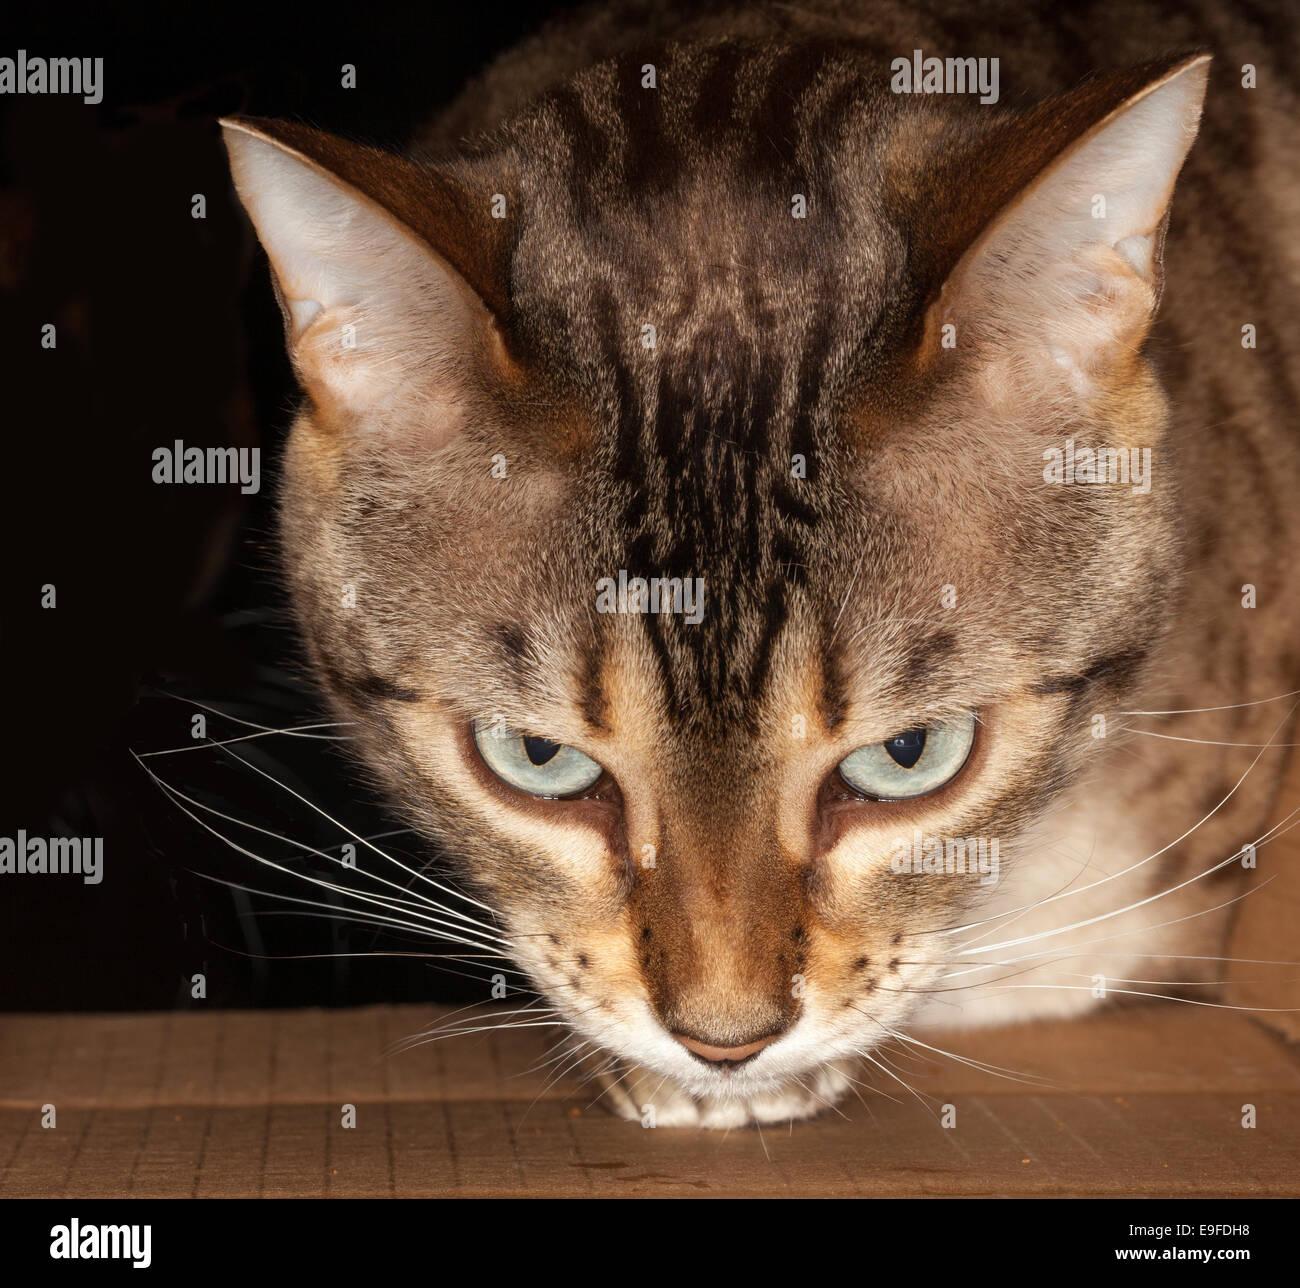 Bengal cat peering through cardboard box - Stock Image